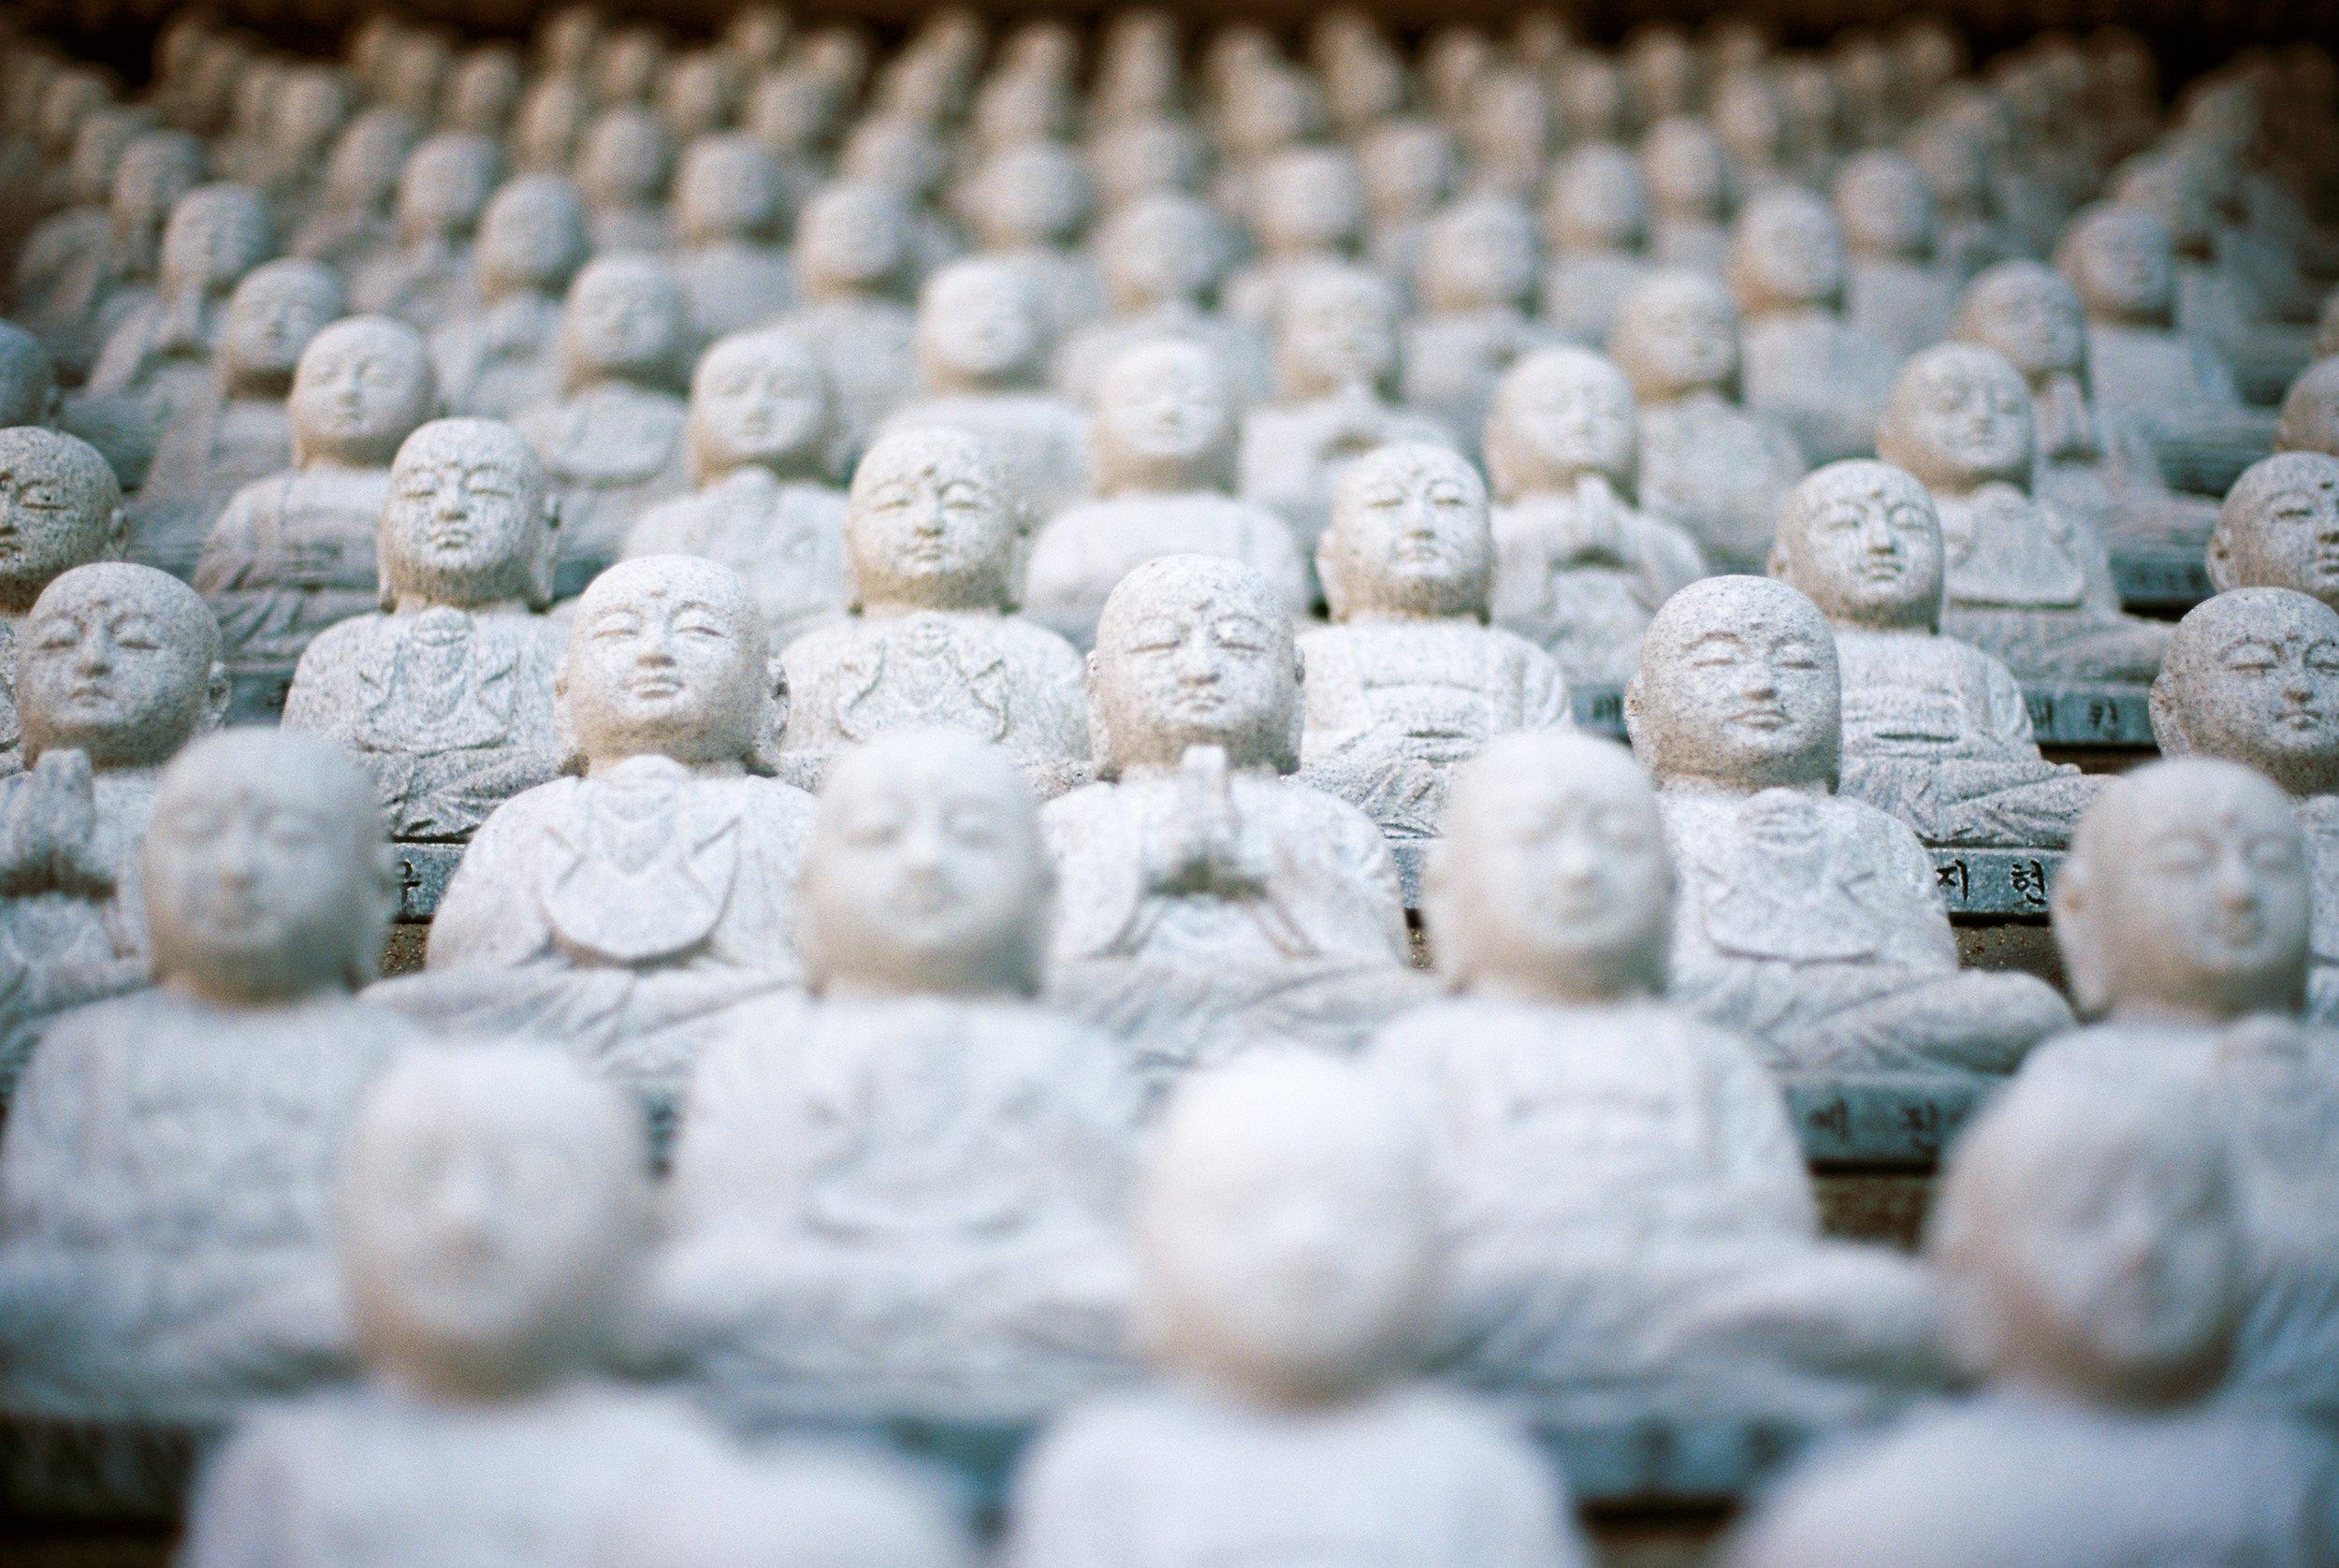 buddha-statues-rows.jpg